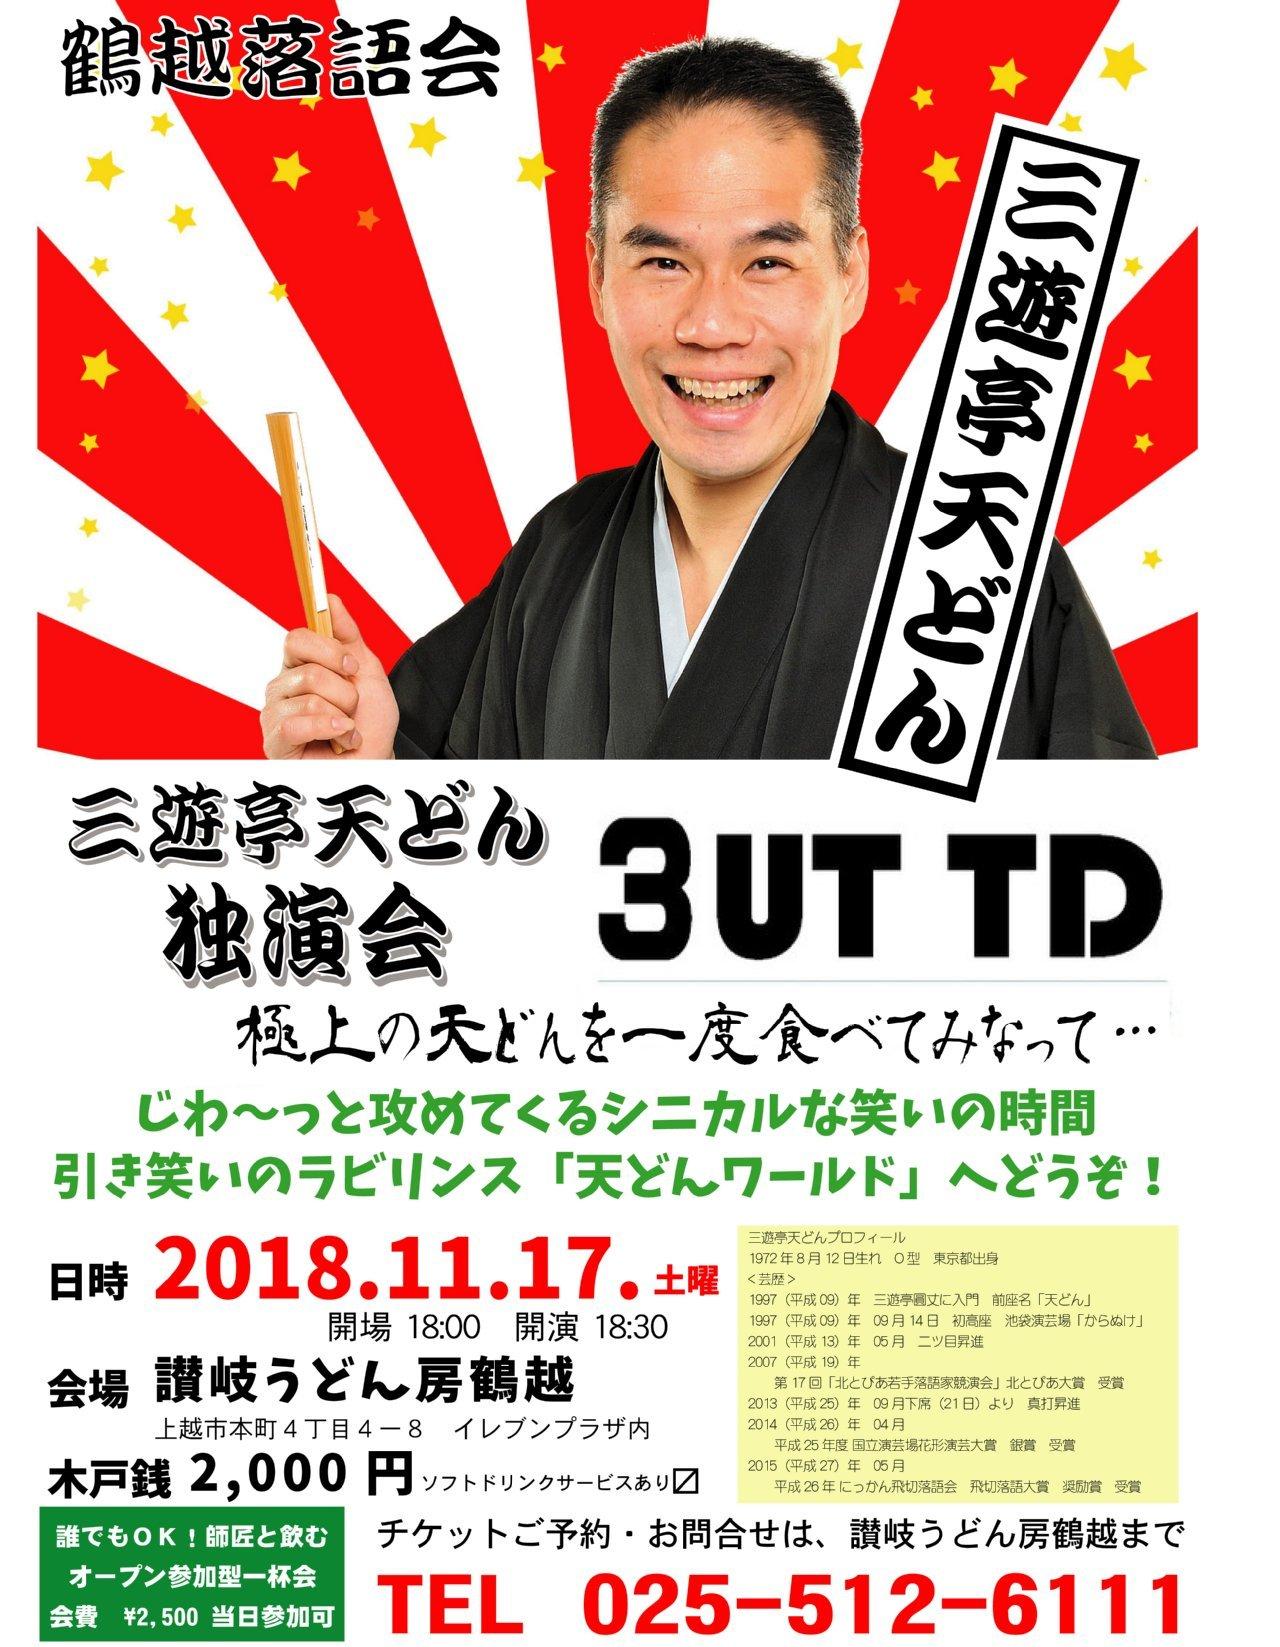 11/8 RICKYライブ、11/17三遊亭天どん落語会_c0092877_23351065.jpg